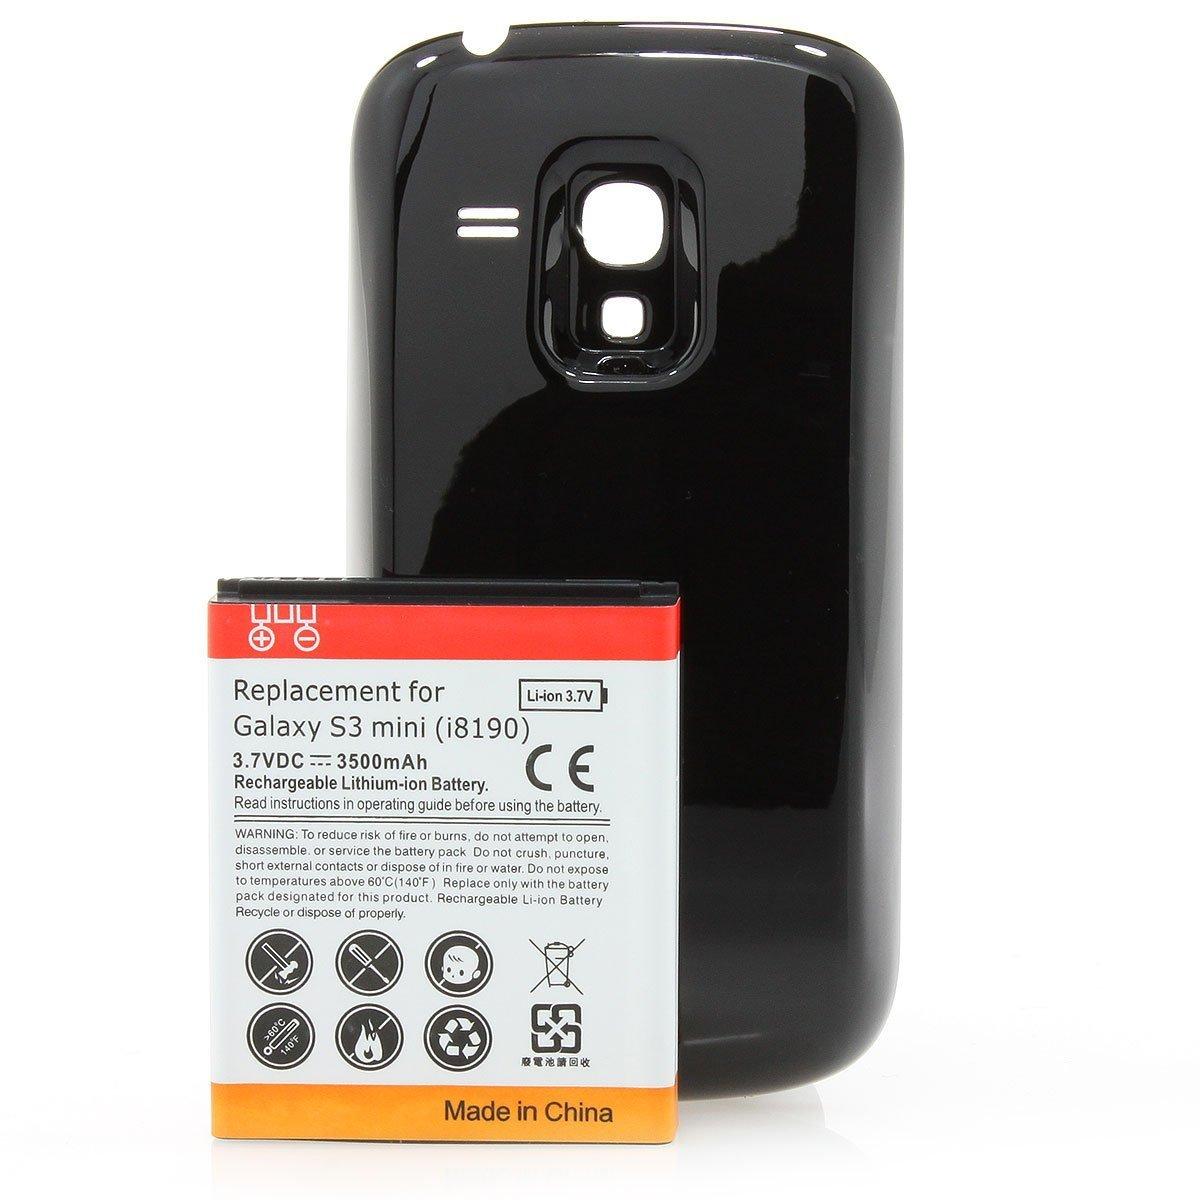 XAiOX POWER Ersatz Akku für Samsung Galaxy S3 Mini i8190 mit 3500 mAh  Li-Ion inkl. Akkufach Akkudeckel in schwarz - ersetzt EB425161LU:  Amazon.de: ...